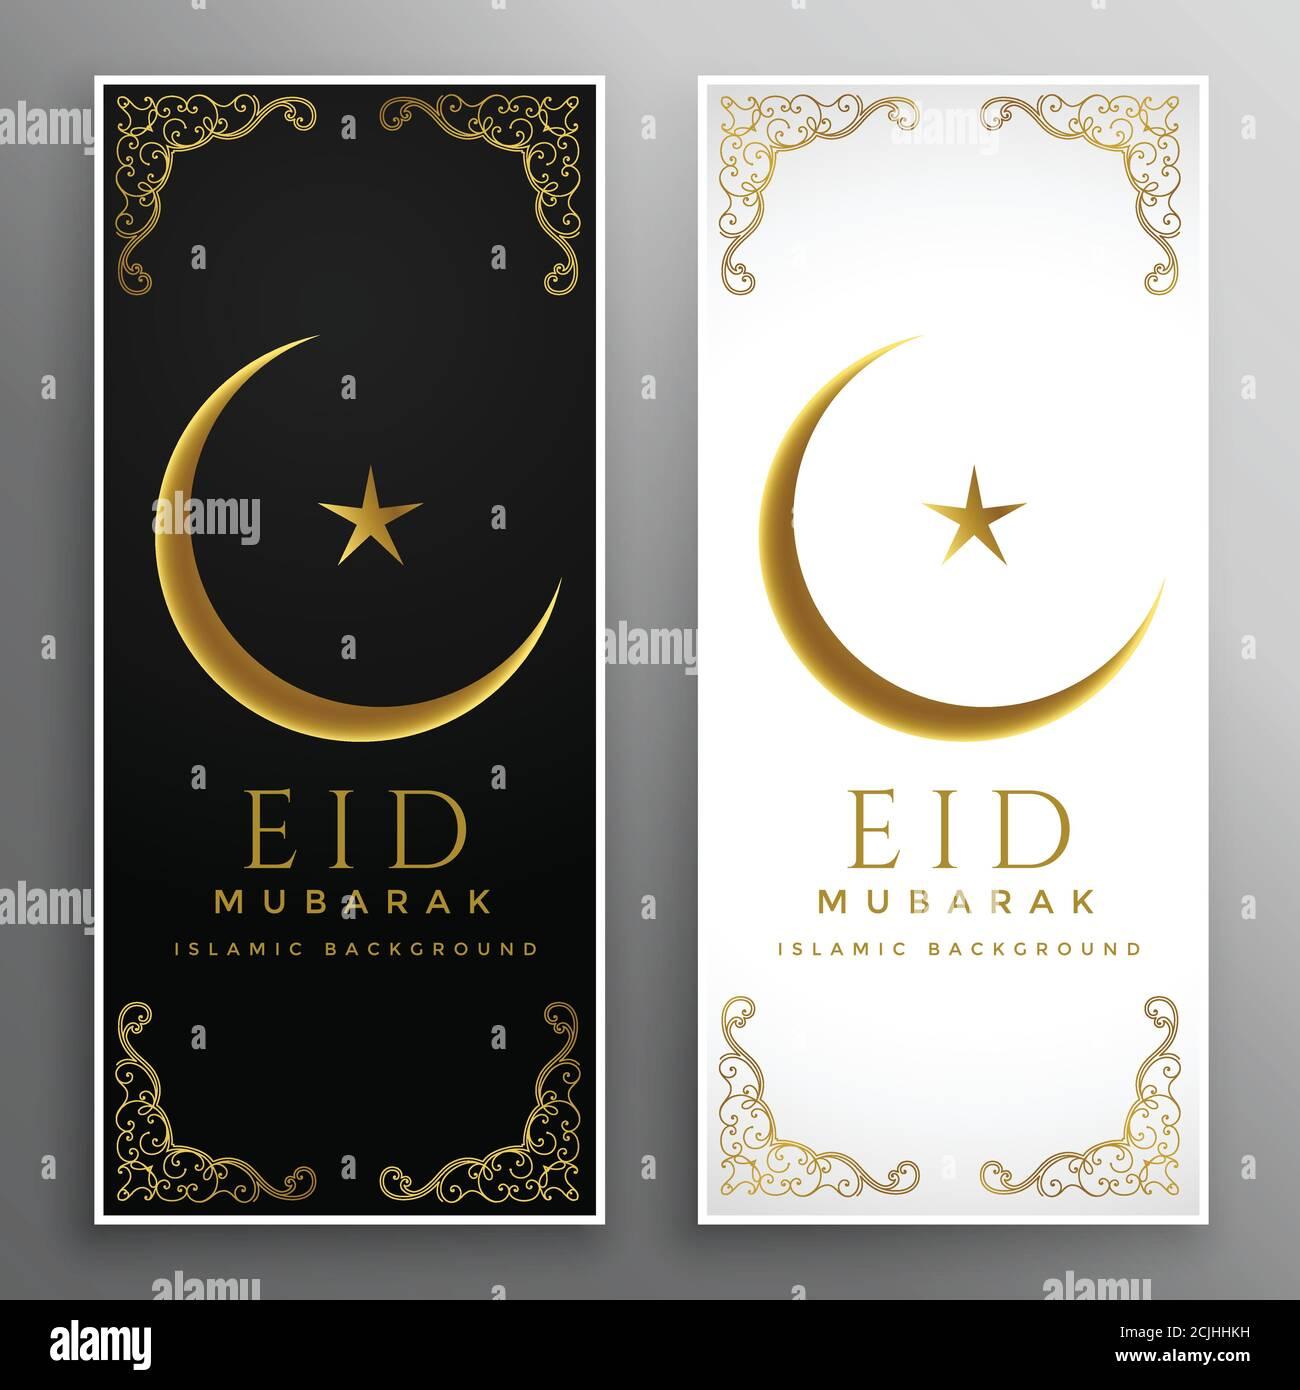 Elegant Black And White Eid Mubarak Card Design Stock Vector Image Art Alamy